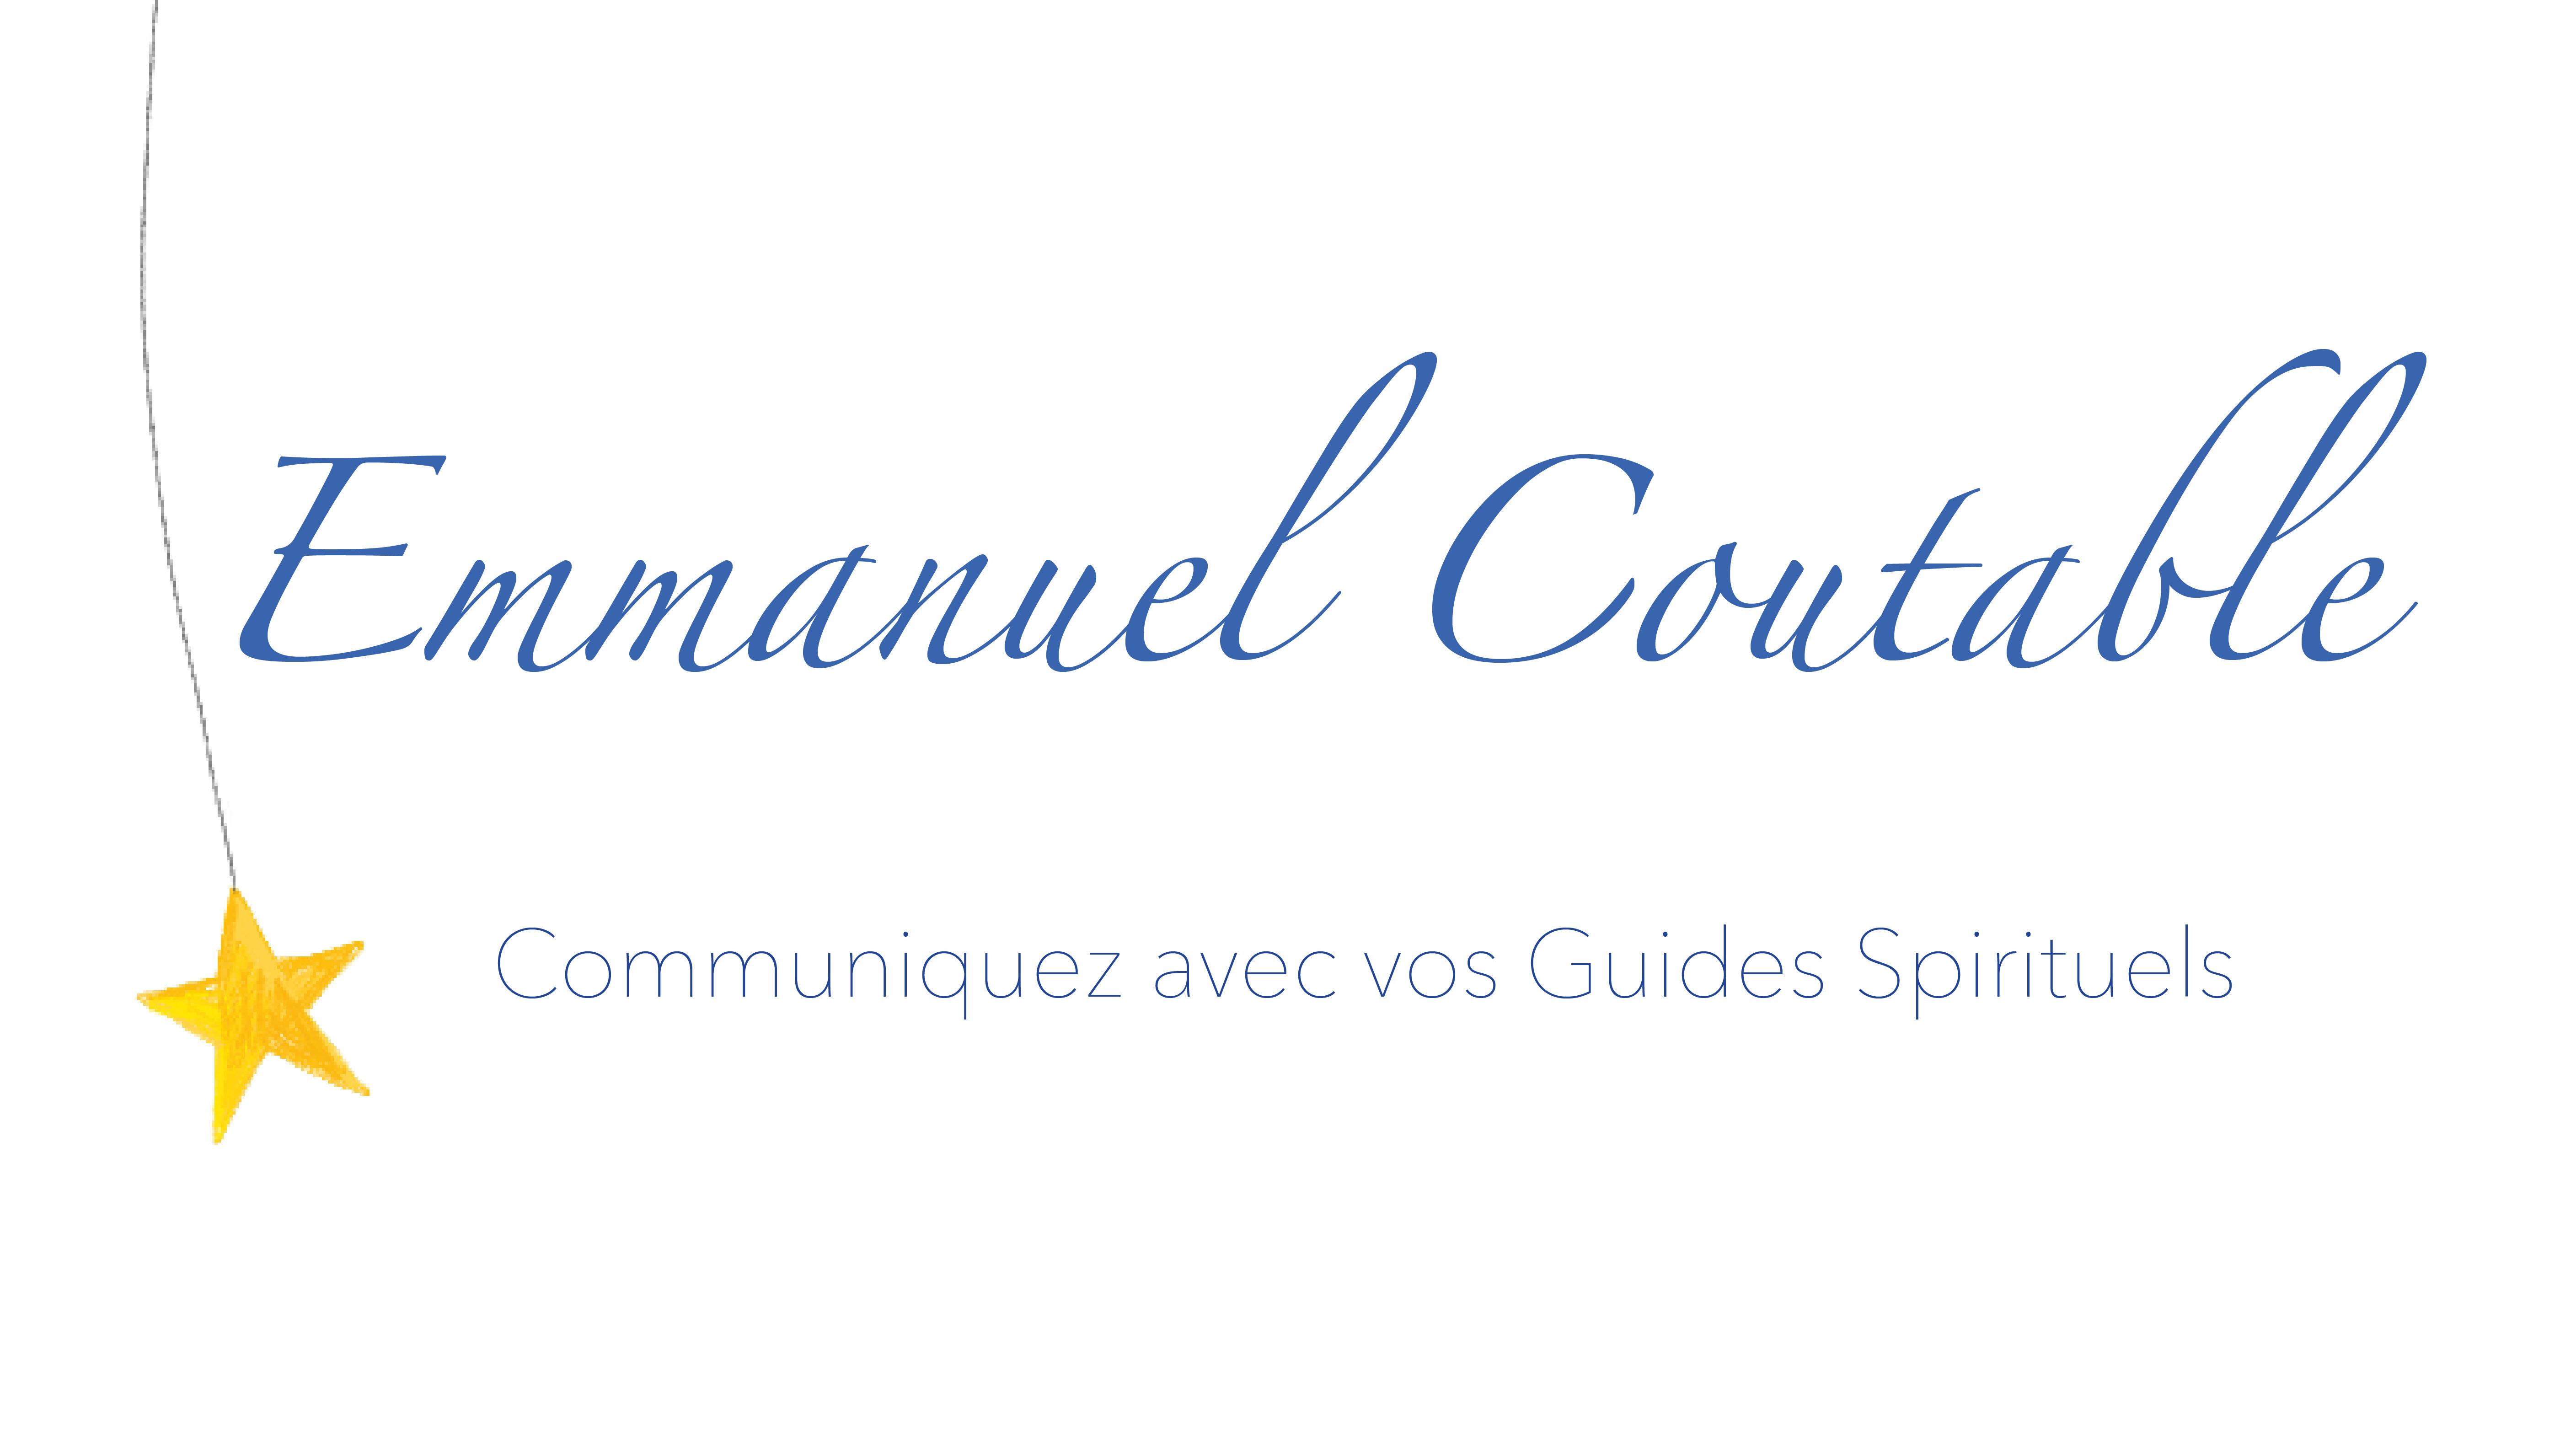 Emmanuel Coutable